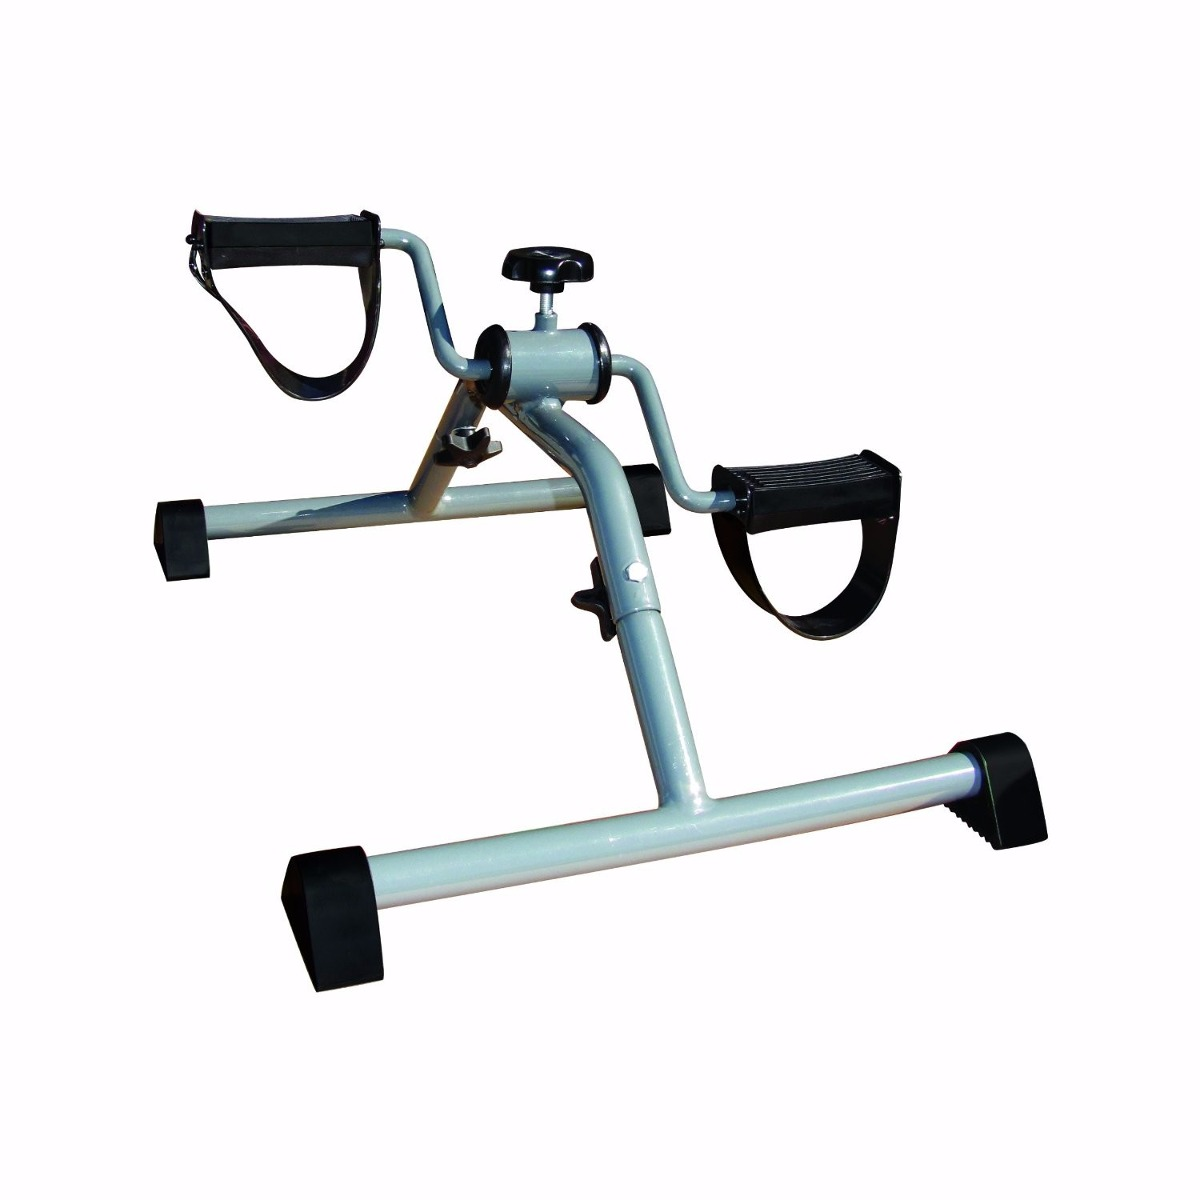 Maquina ejercicio cap barbel pedaleo bici fija tension for Maquinas de ejercicios